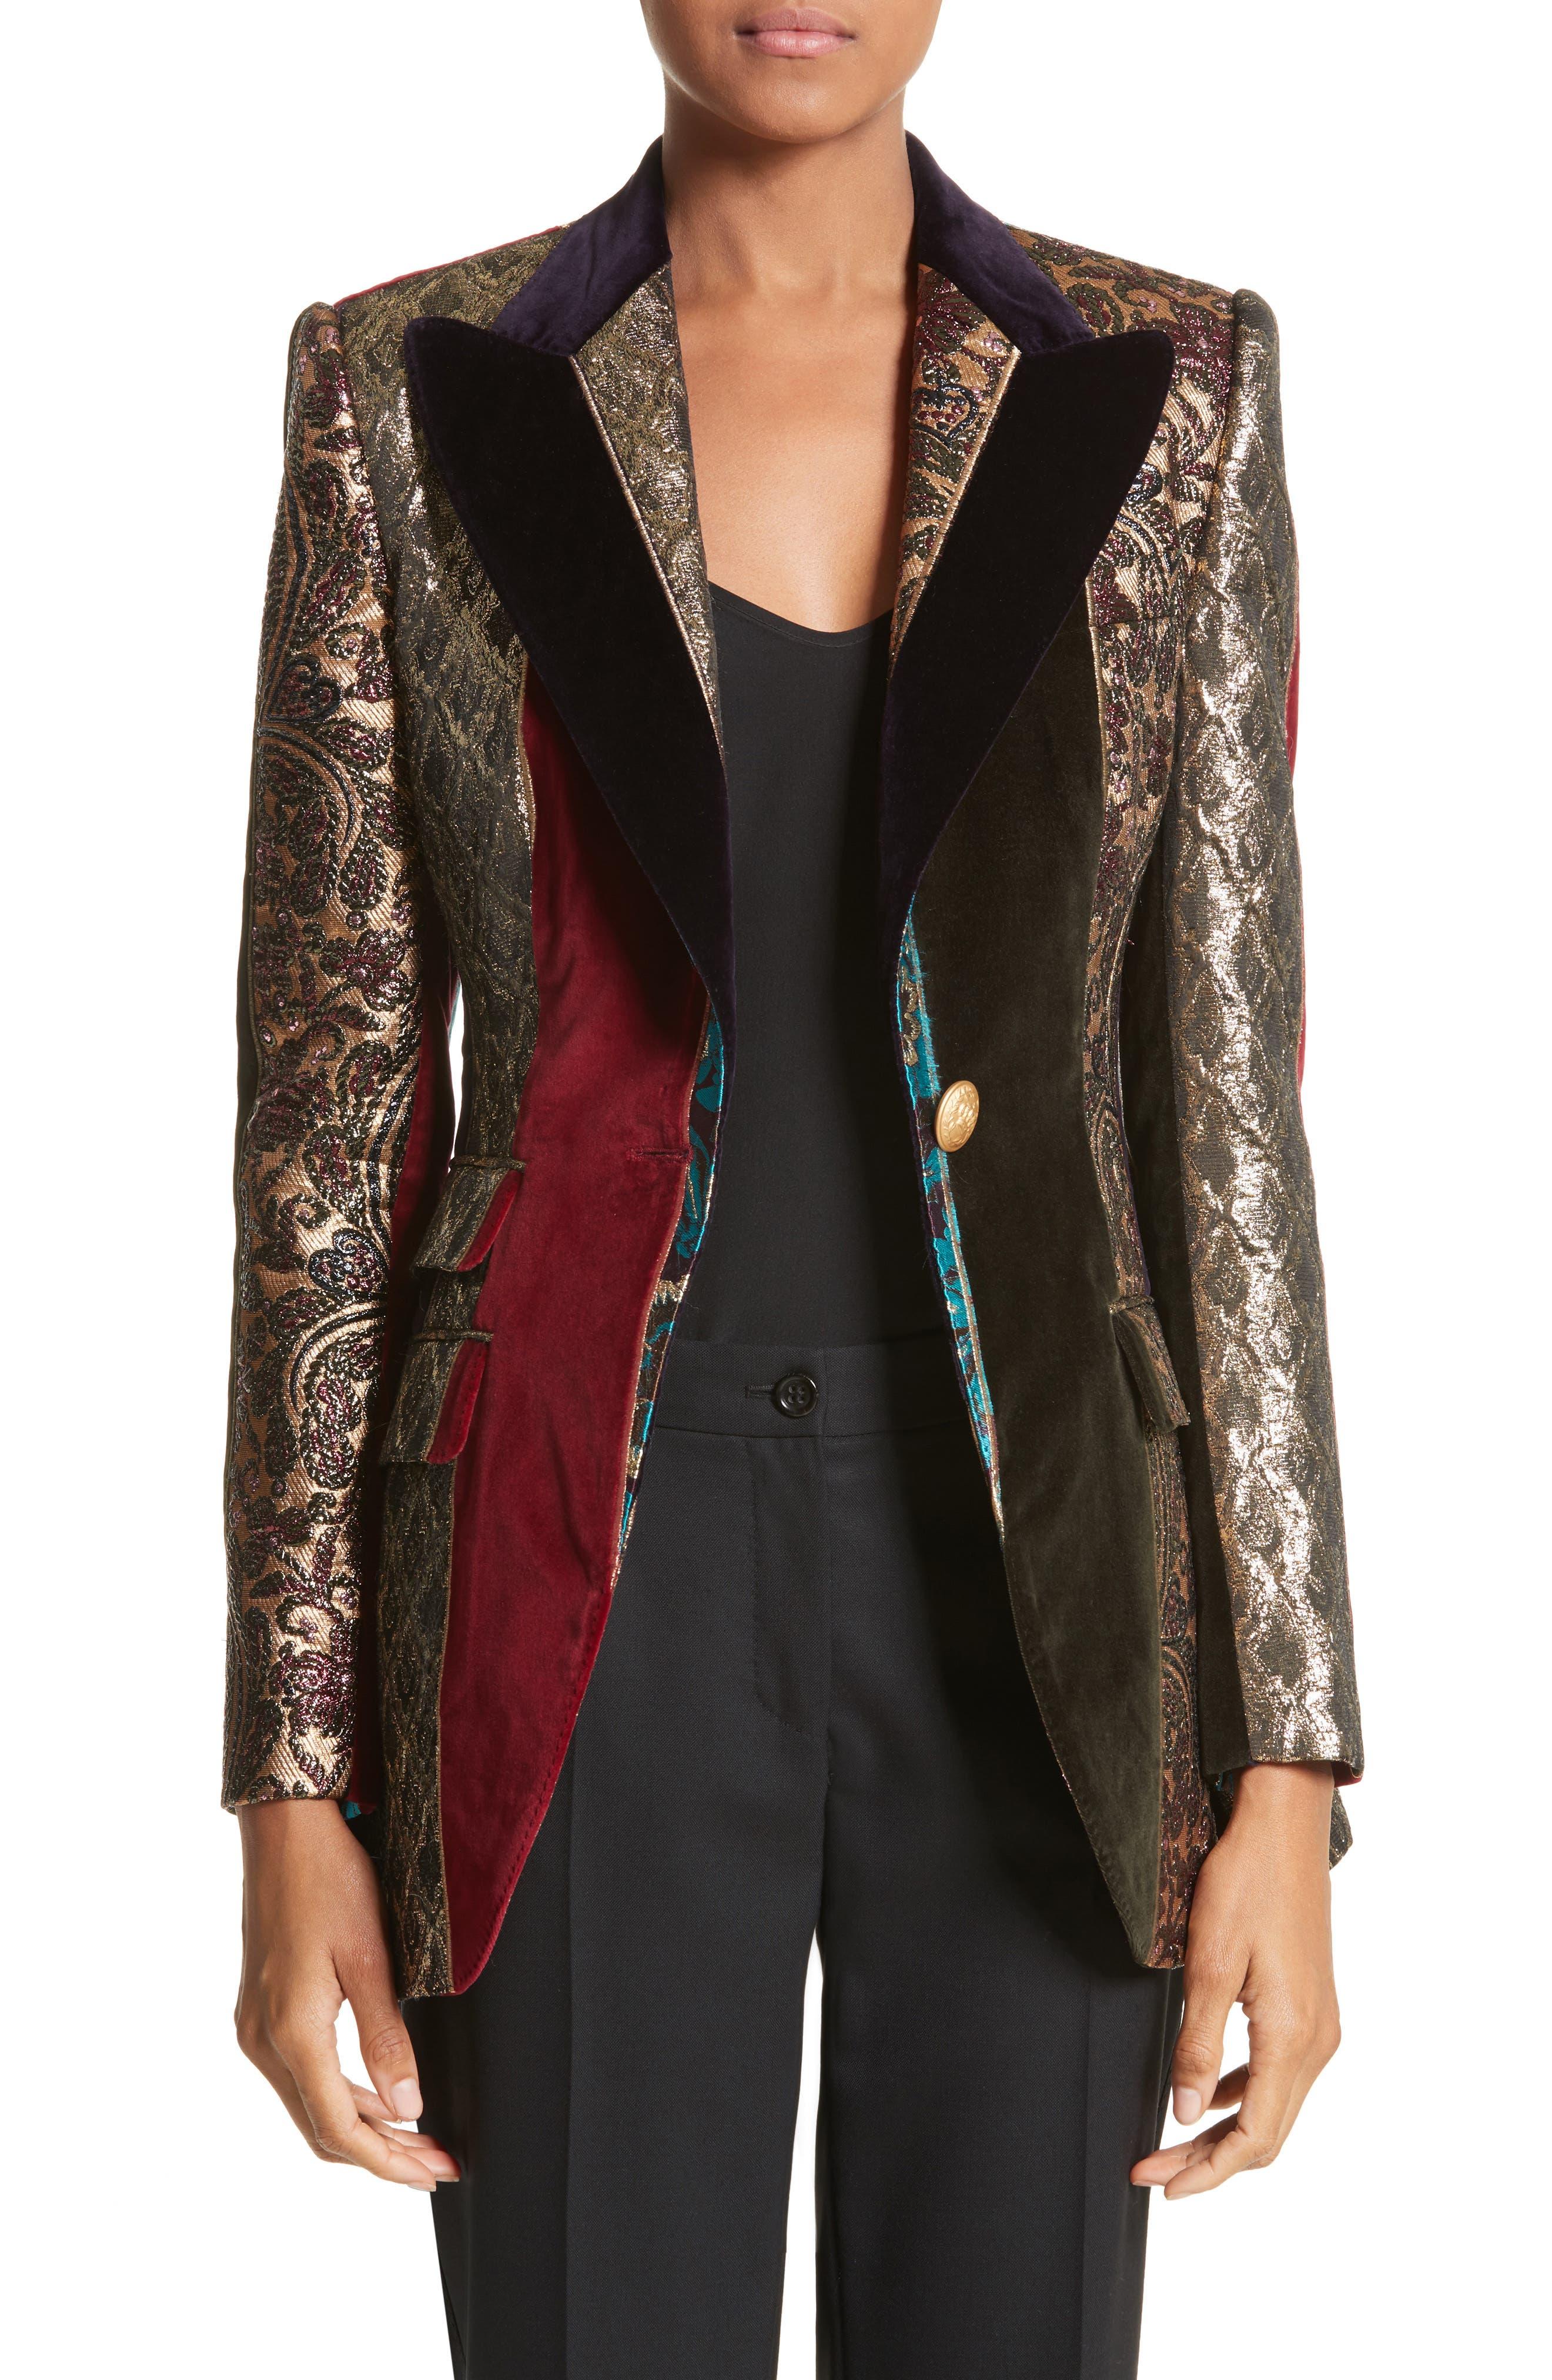 Dolce&Gabbana Velvet & Jacquard Patchwork Jacket